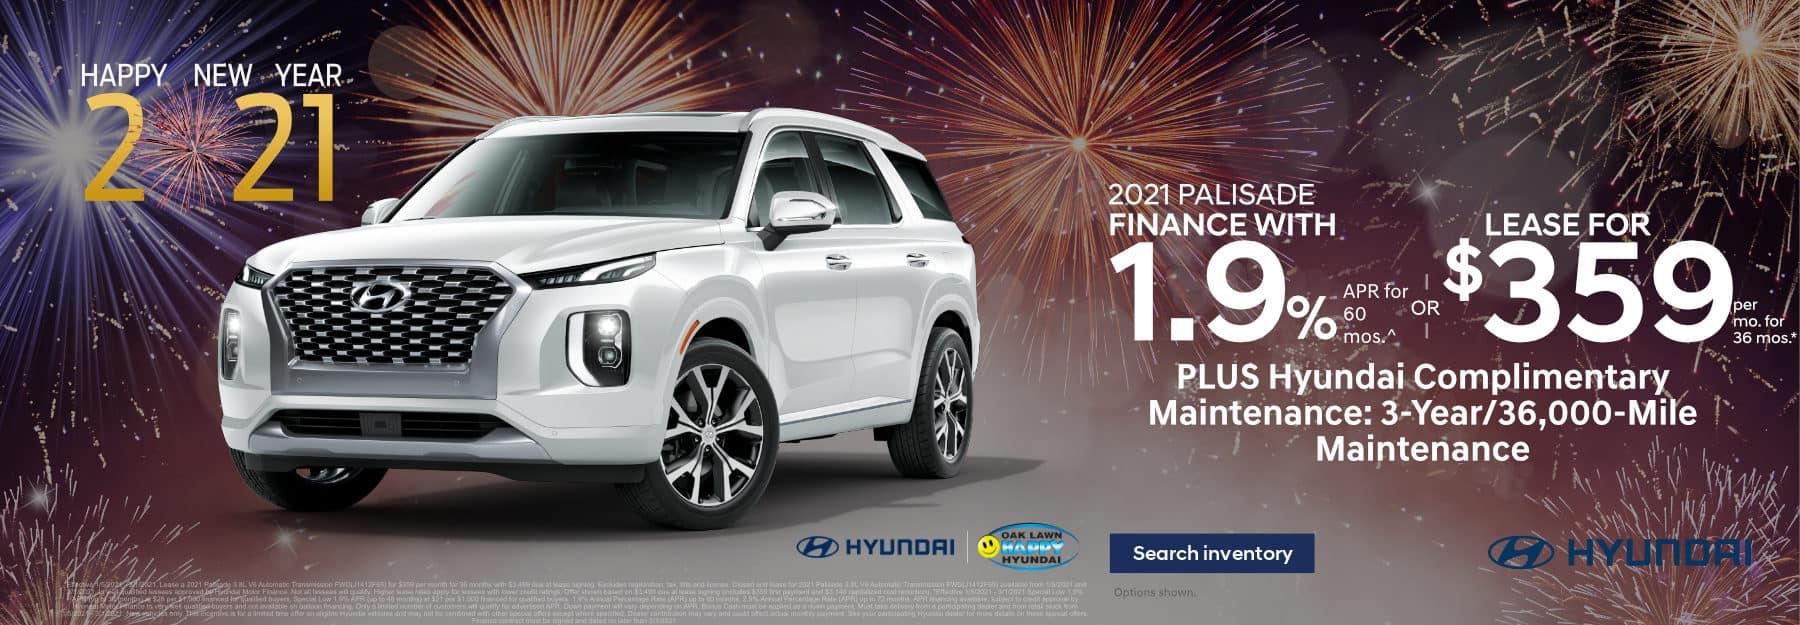 January_2021_PALISADE_Happy_Hyundai